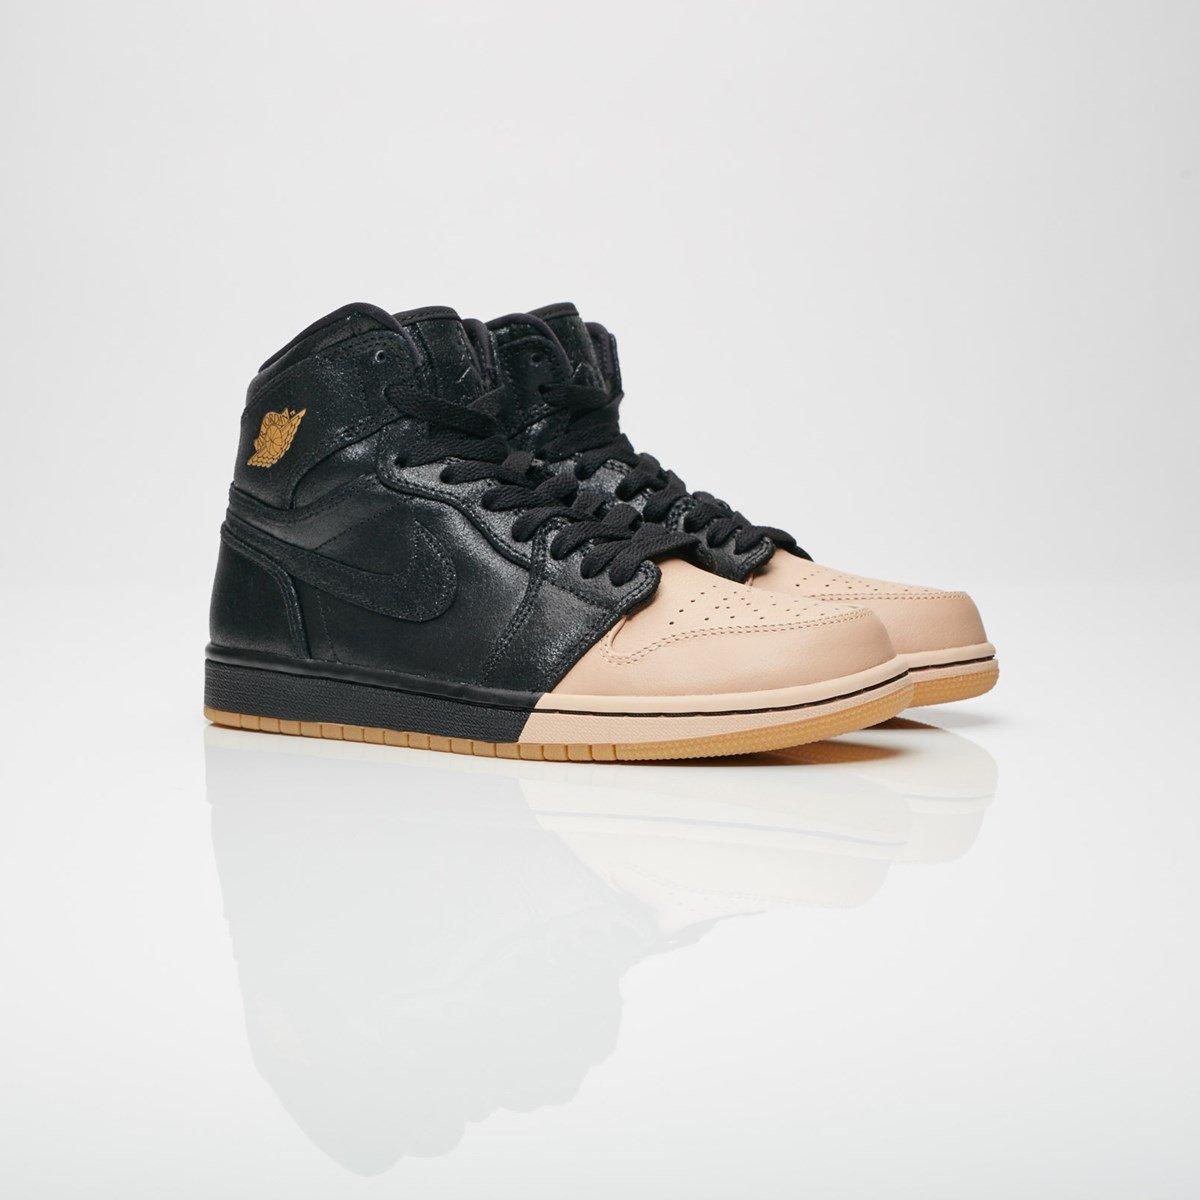 separation shoes 7fd99 45db1 jordan brand wmns air 1 retro hi premium ah7389 007 sneakers   streetwear  på n aum